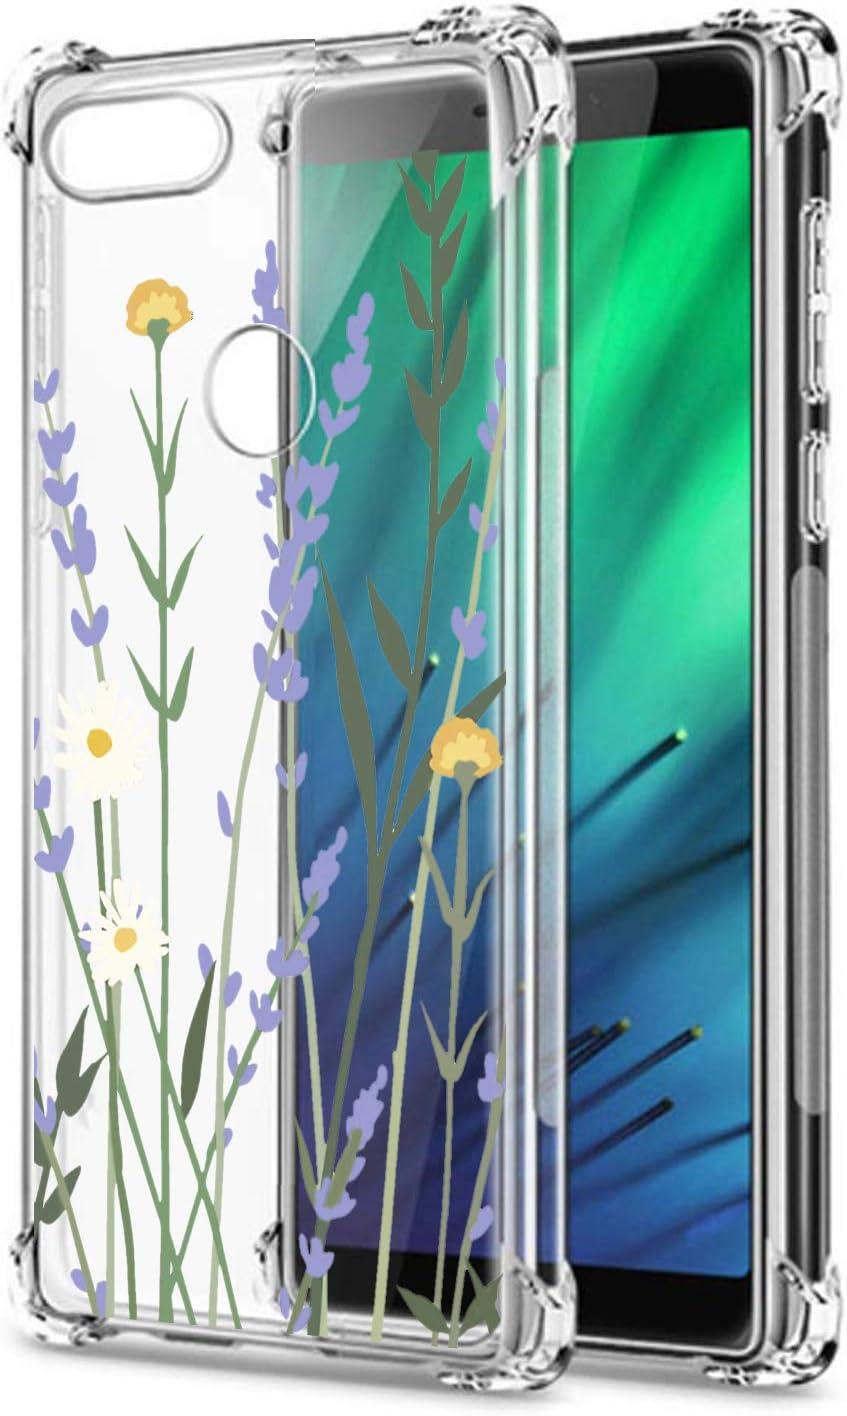 Oihxse Cristal Compatible con Xiaomi Redmi Note 7/Note 7 Pro/Note 7S Funda Transparente TPU Silicona Estuche Airbag Esquinas Anti-Choque Anti Rasguños Diseño Rosa Flower Caso (Flores A8)